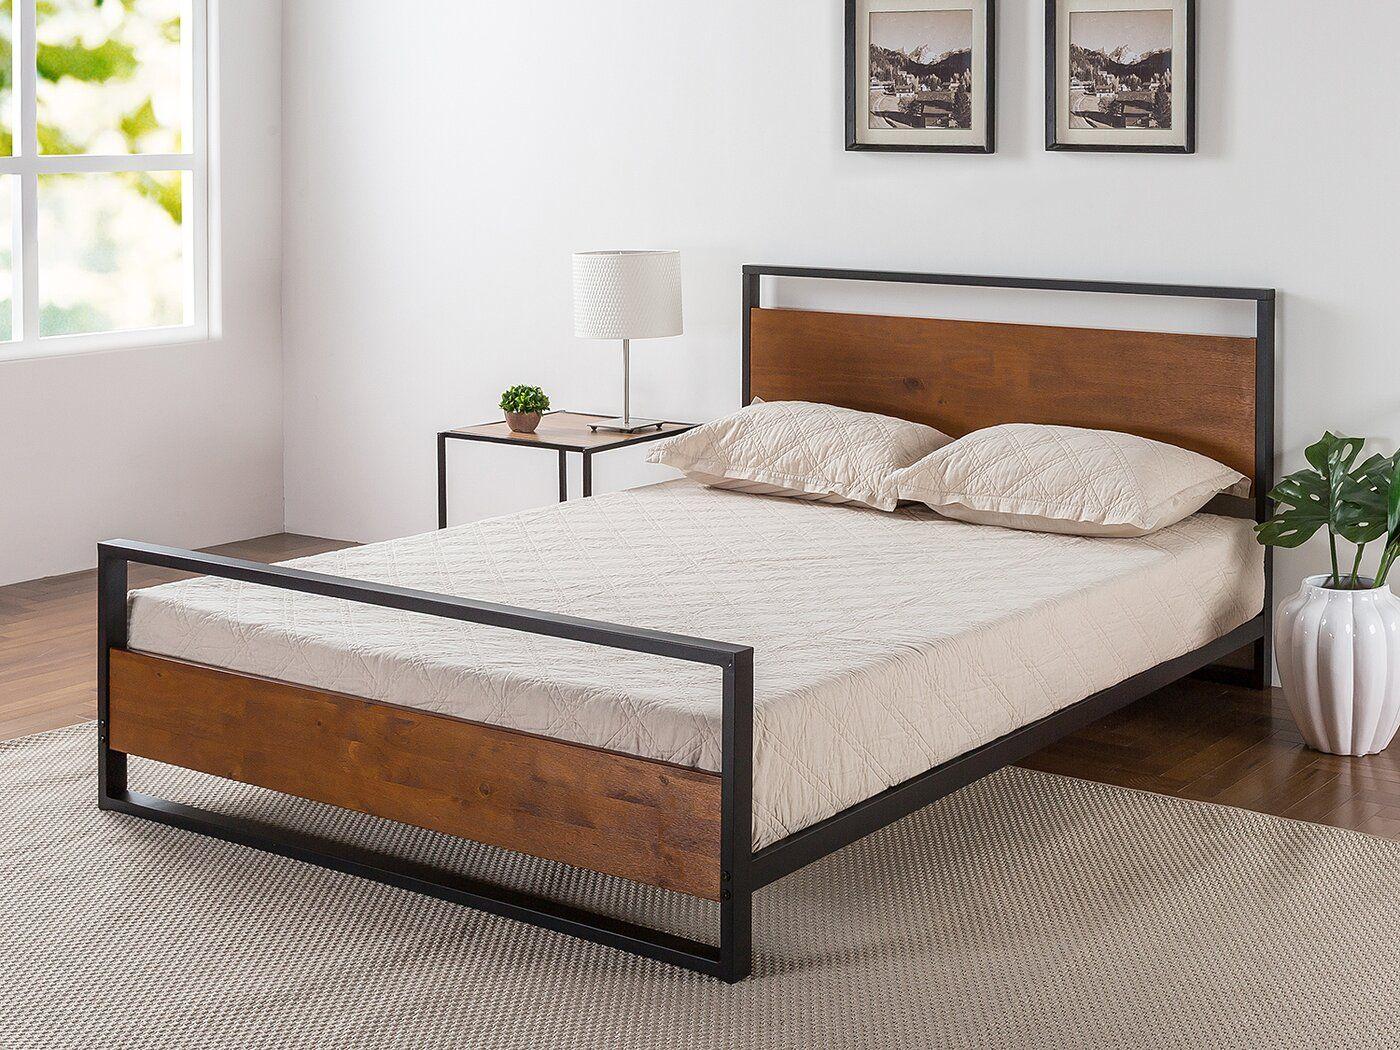 Makai Platform Bed Contemporary Platform Bed Wood